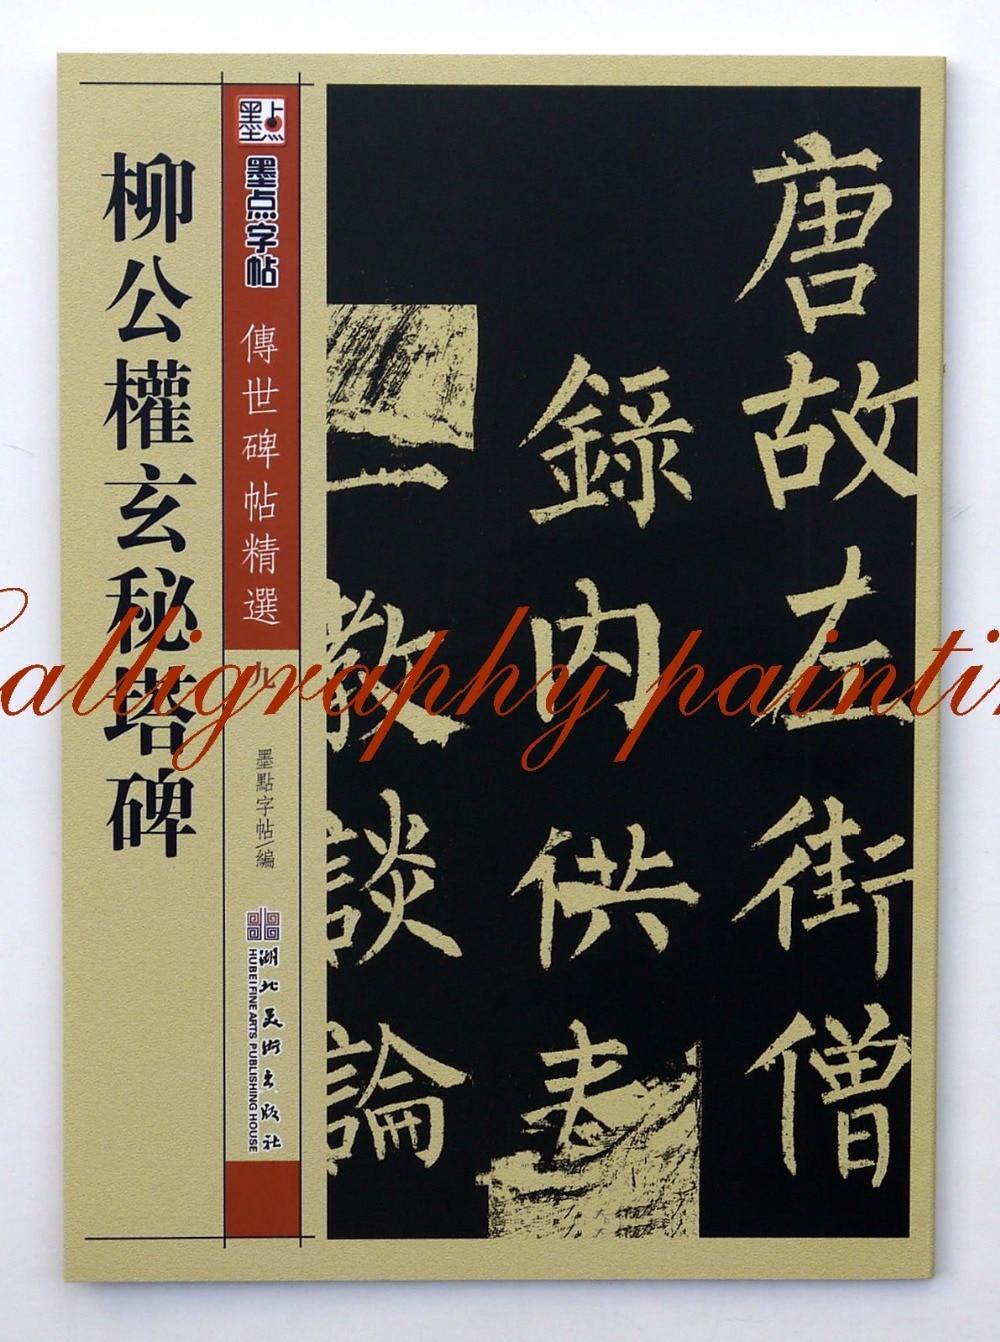 Chinese calligraphy book Liu Gongquan regular scrip Xuan Mi Ta bei Chinese calligraphy book Liu Gongquan regular scrip Xuan Mi Ta bei